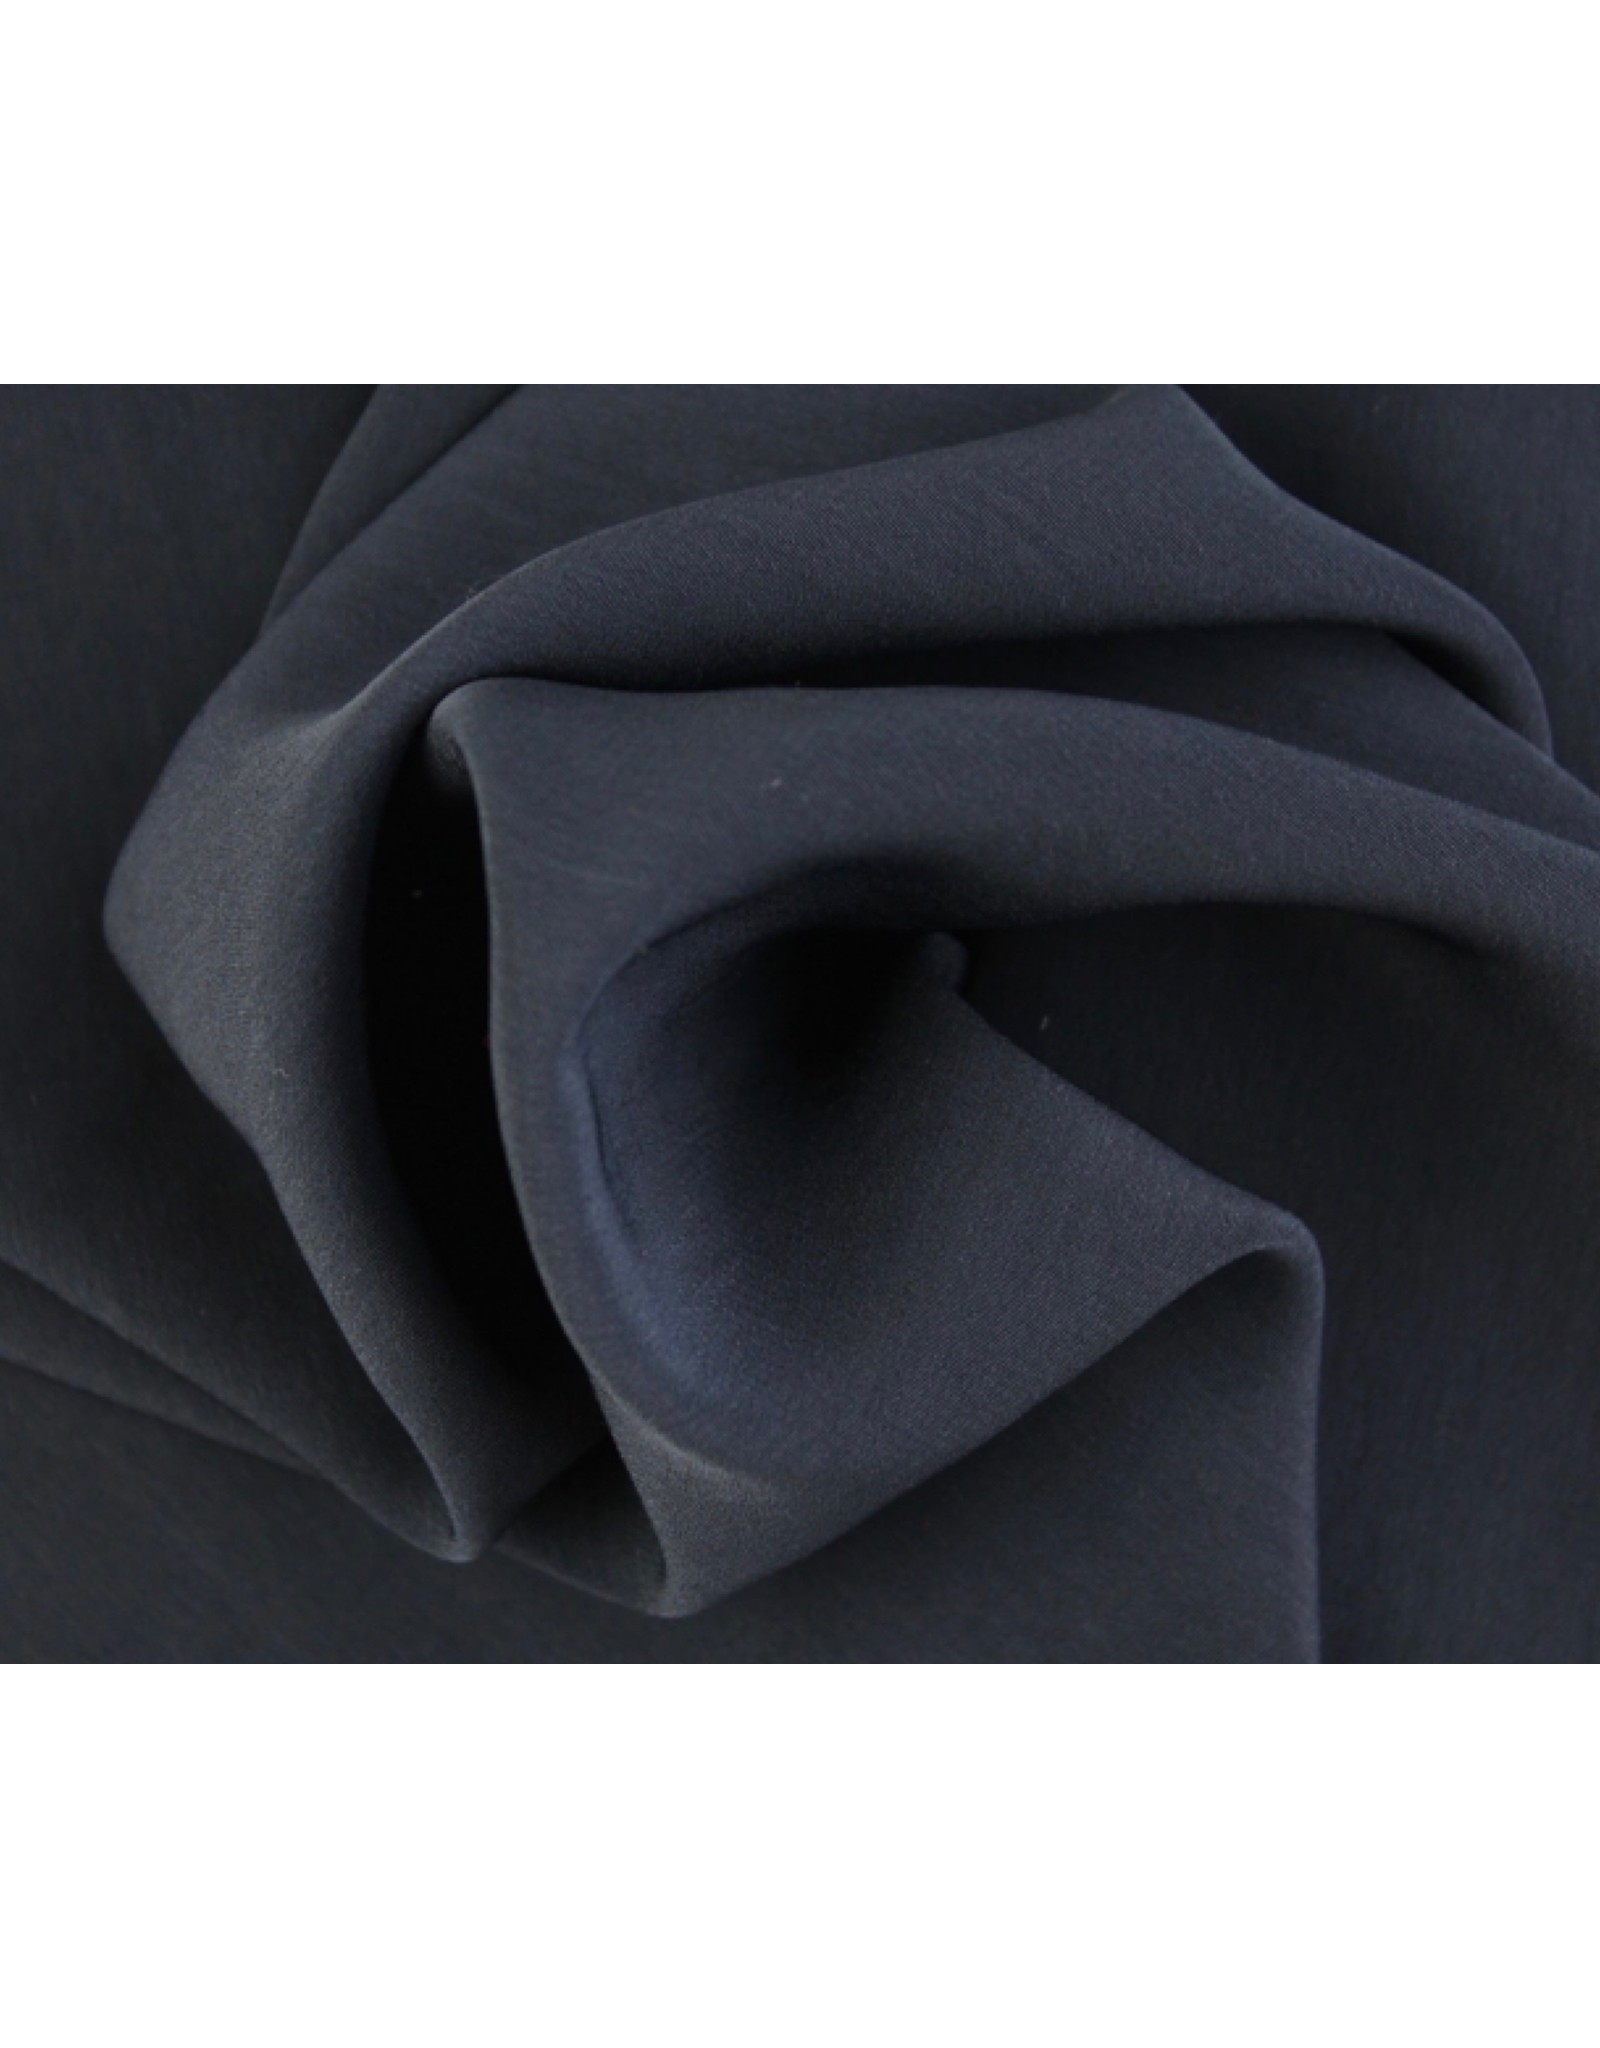 Peach fabric Navy